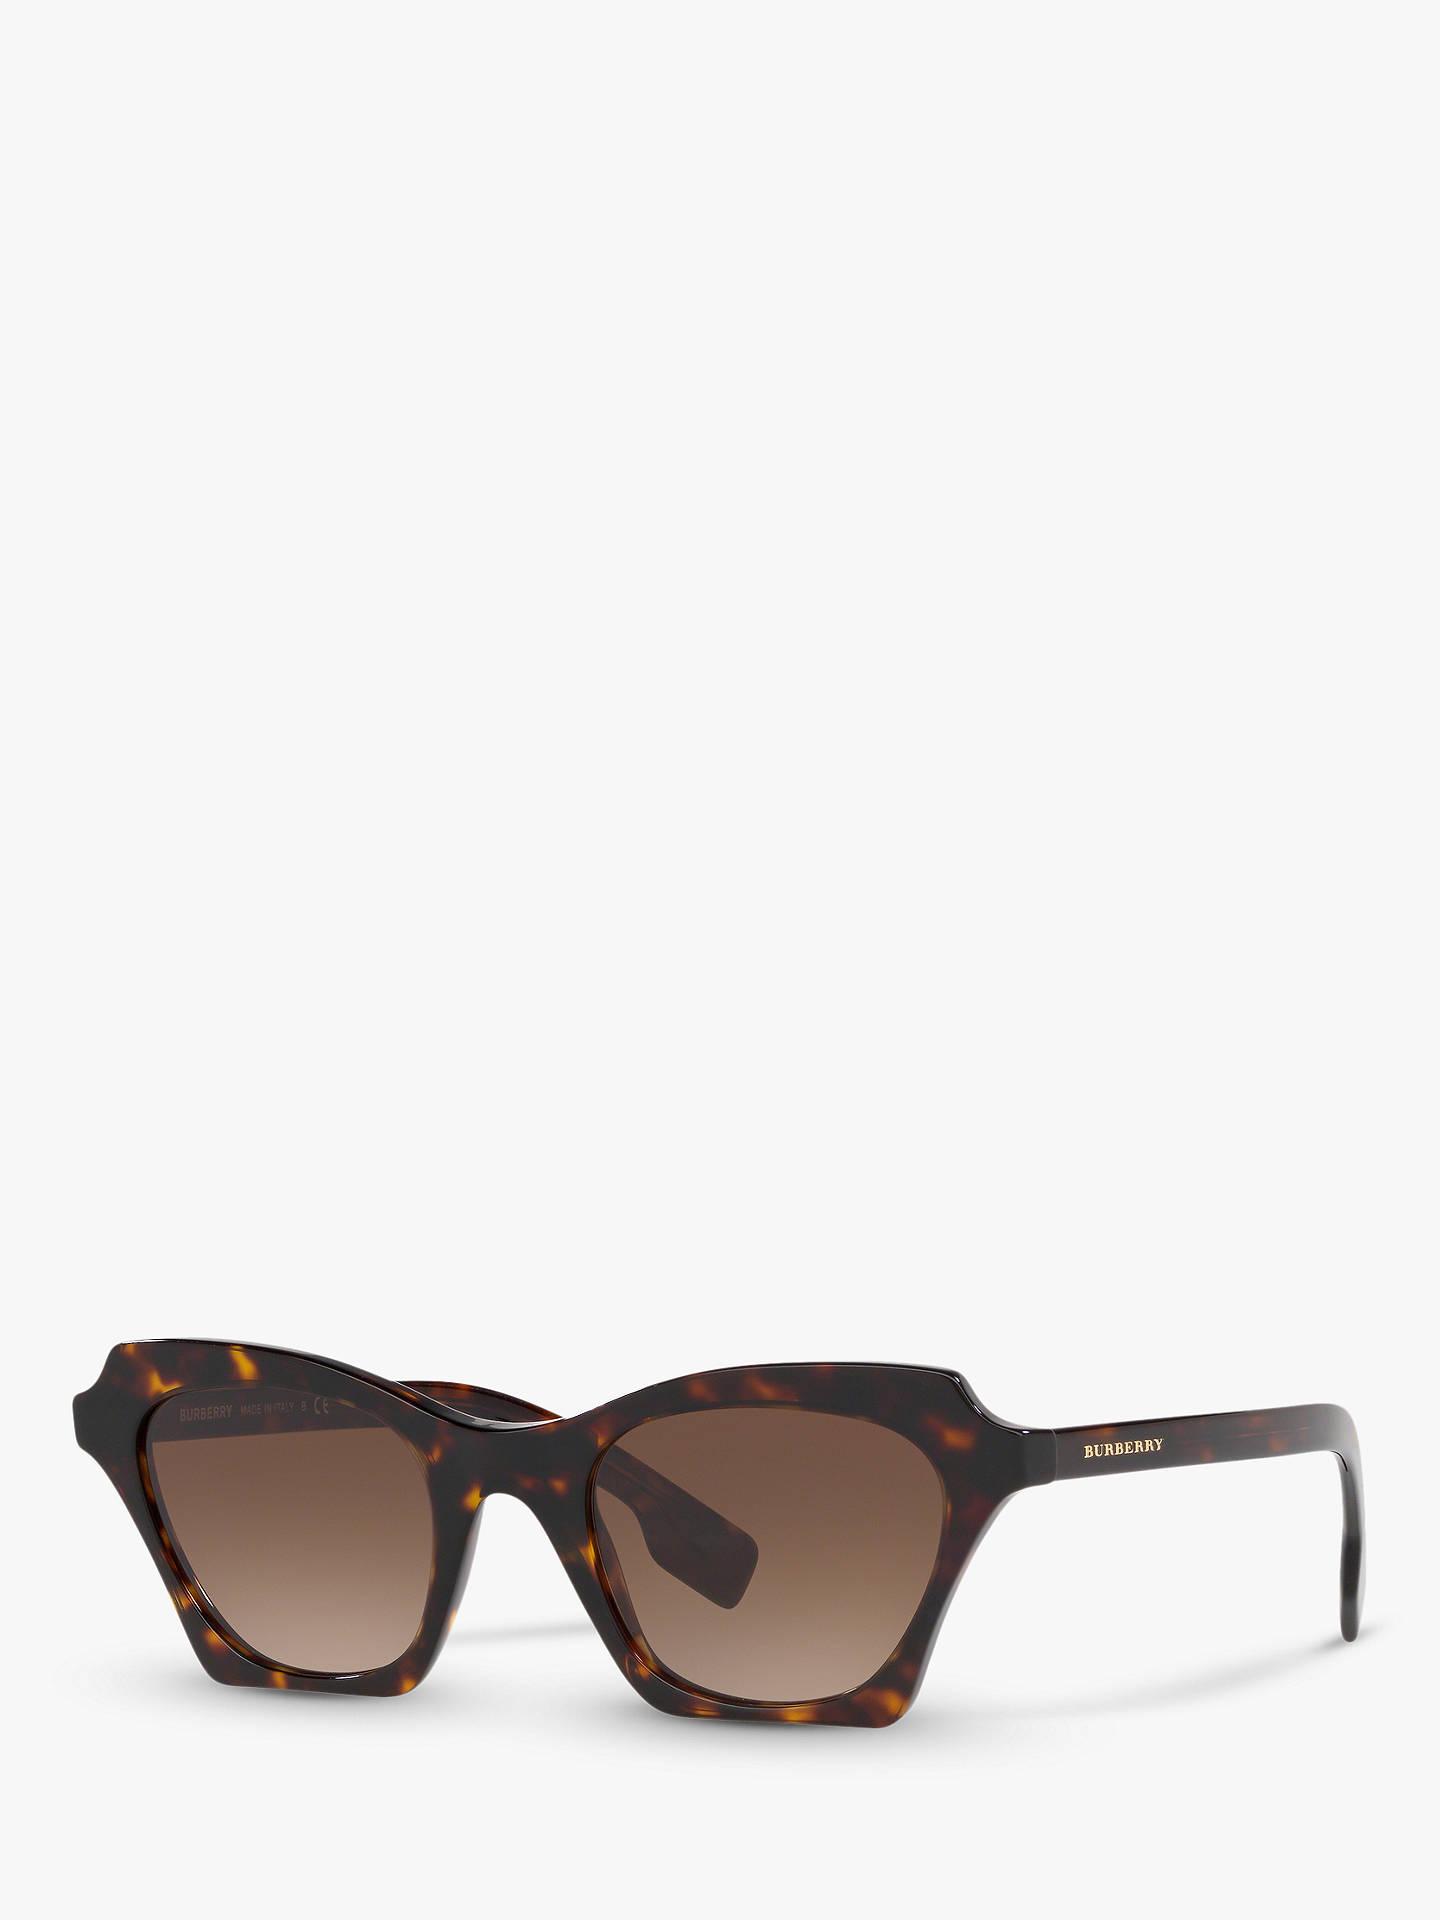 b4402c66a67 Buy Burberry BE4283 Women s Square Sunglasses